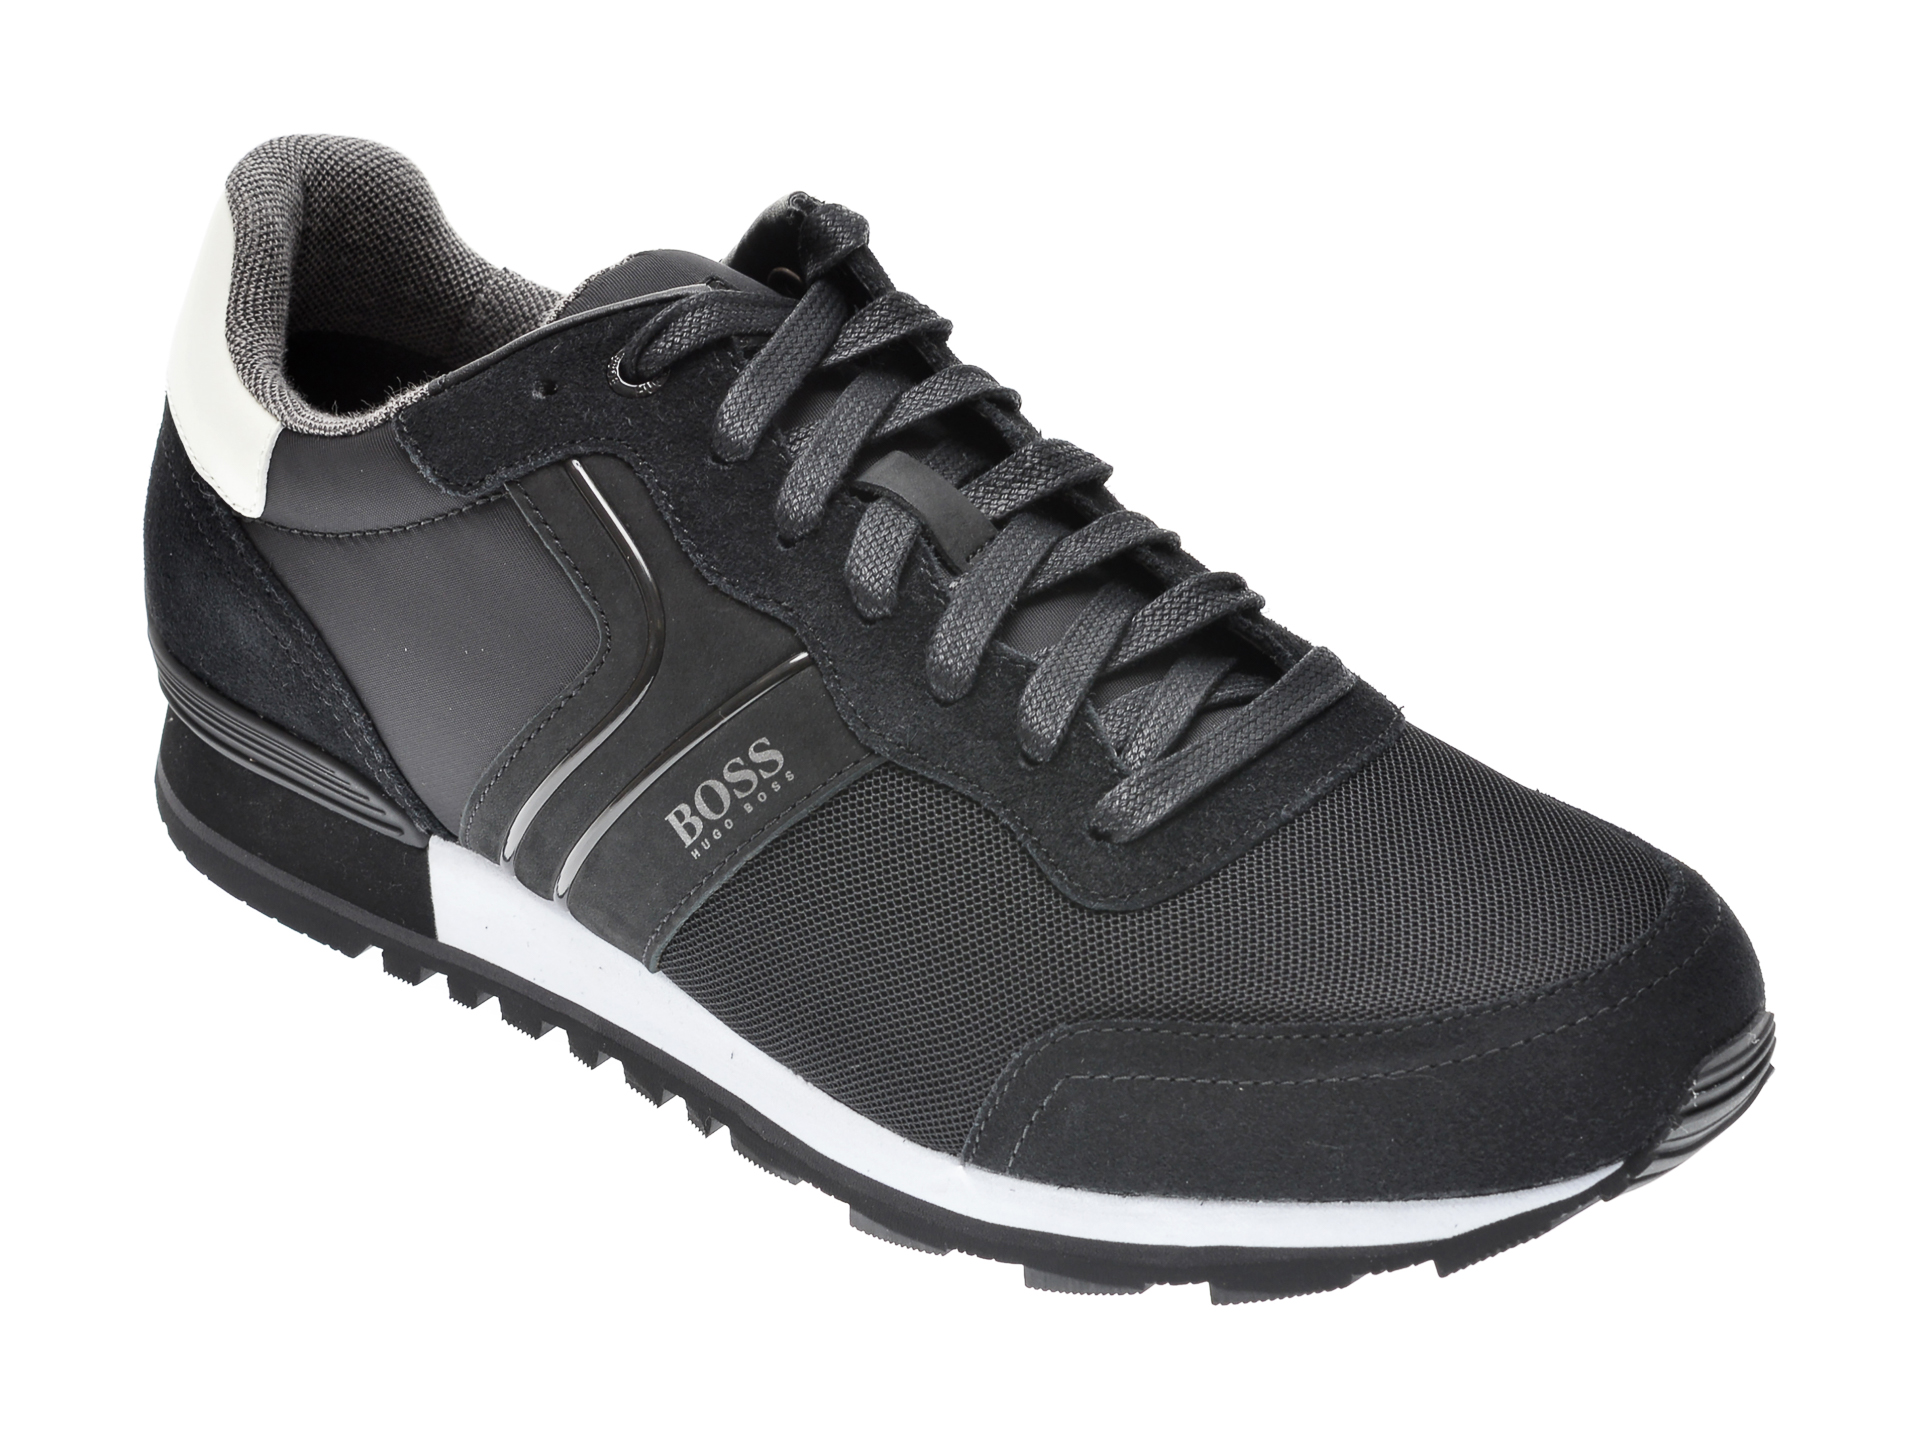 Pantofi sport HUGO BOSS negri, 3661, din material textil imagine